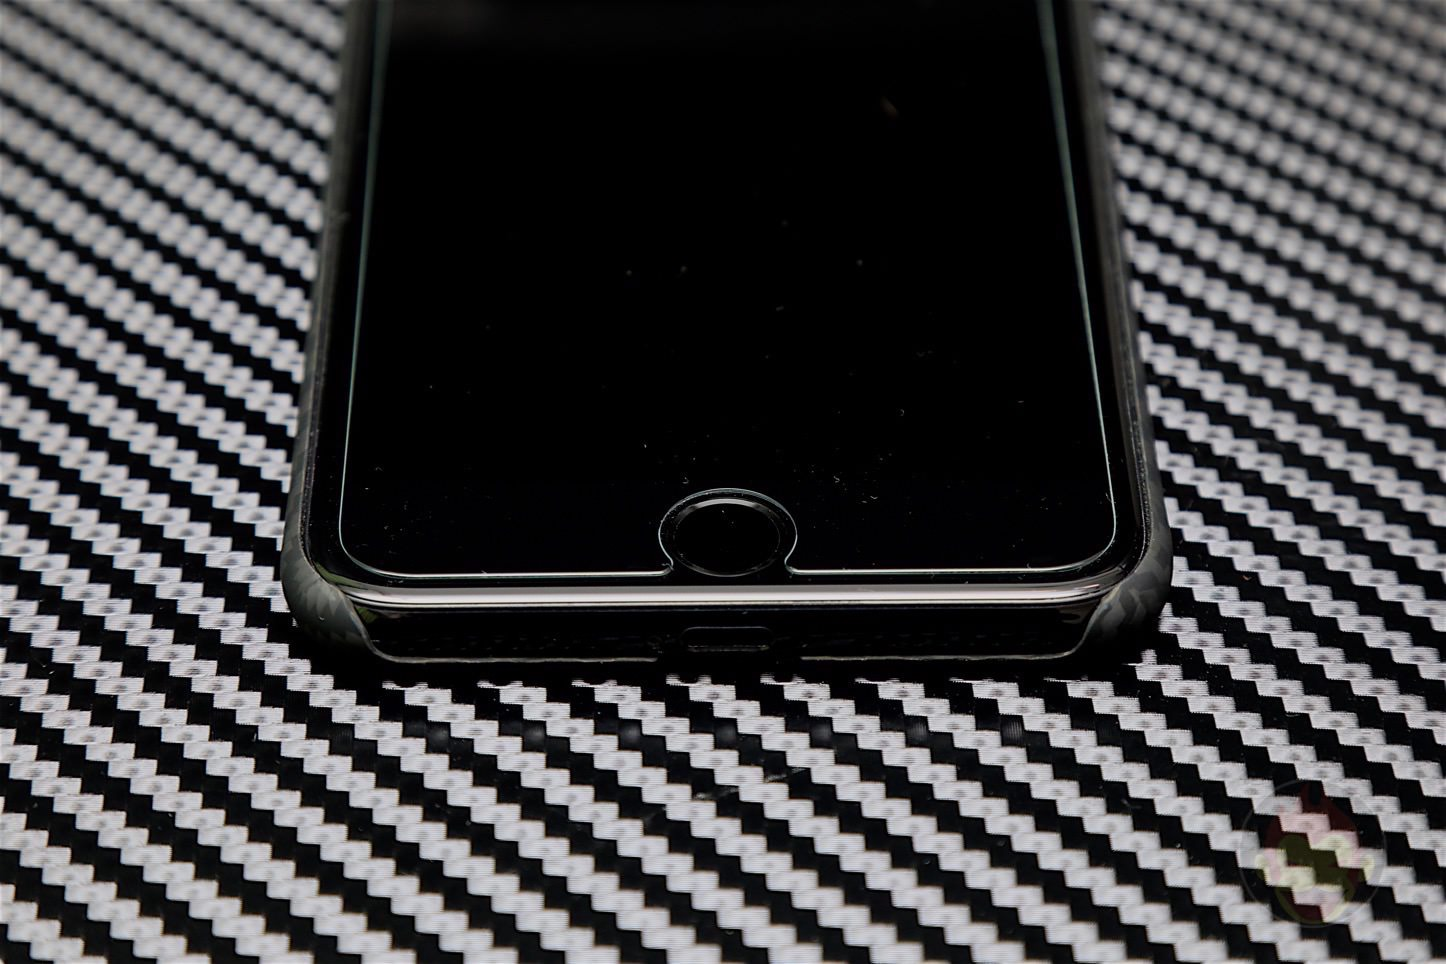 Pitaka-iPhone-Case-Review-09.jpg